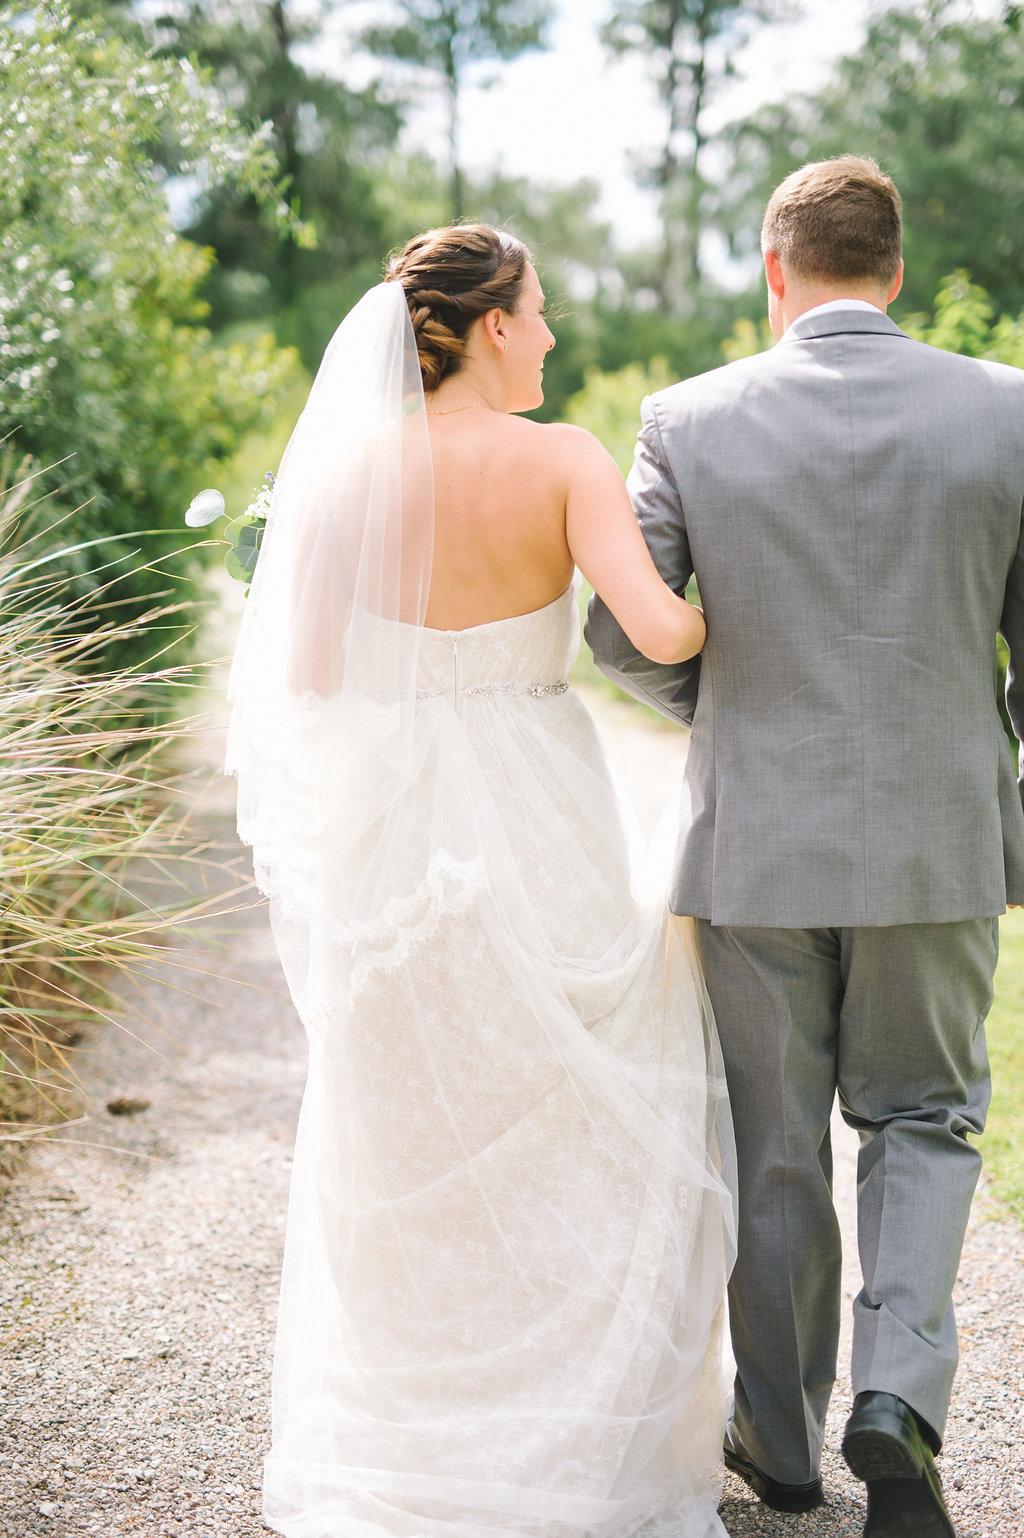 meagan-and-brenden-rach-loves-troy-photography-ivory-and-beau-bridal-boutqiue-ti-adora-wedding-dress-gold-lace-wedding-dress-savannah-wedding-planner-savannah-weddings-oldfield-plantation-wedding-savannah-florist-21.jpg